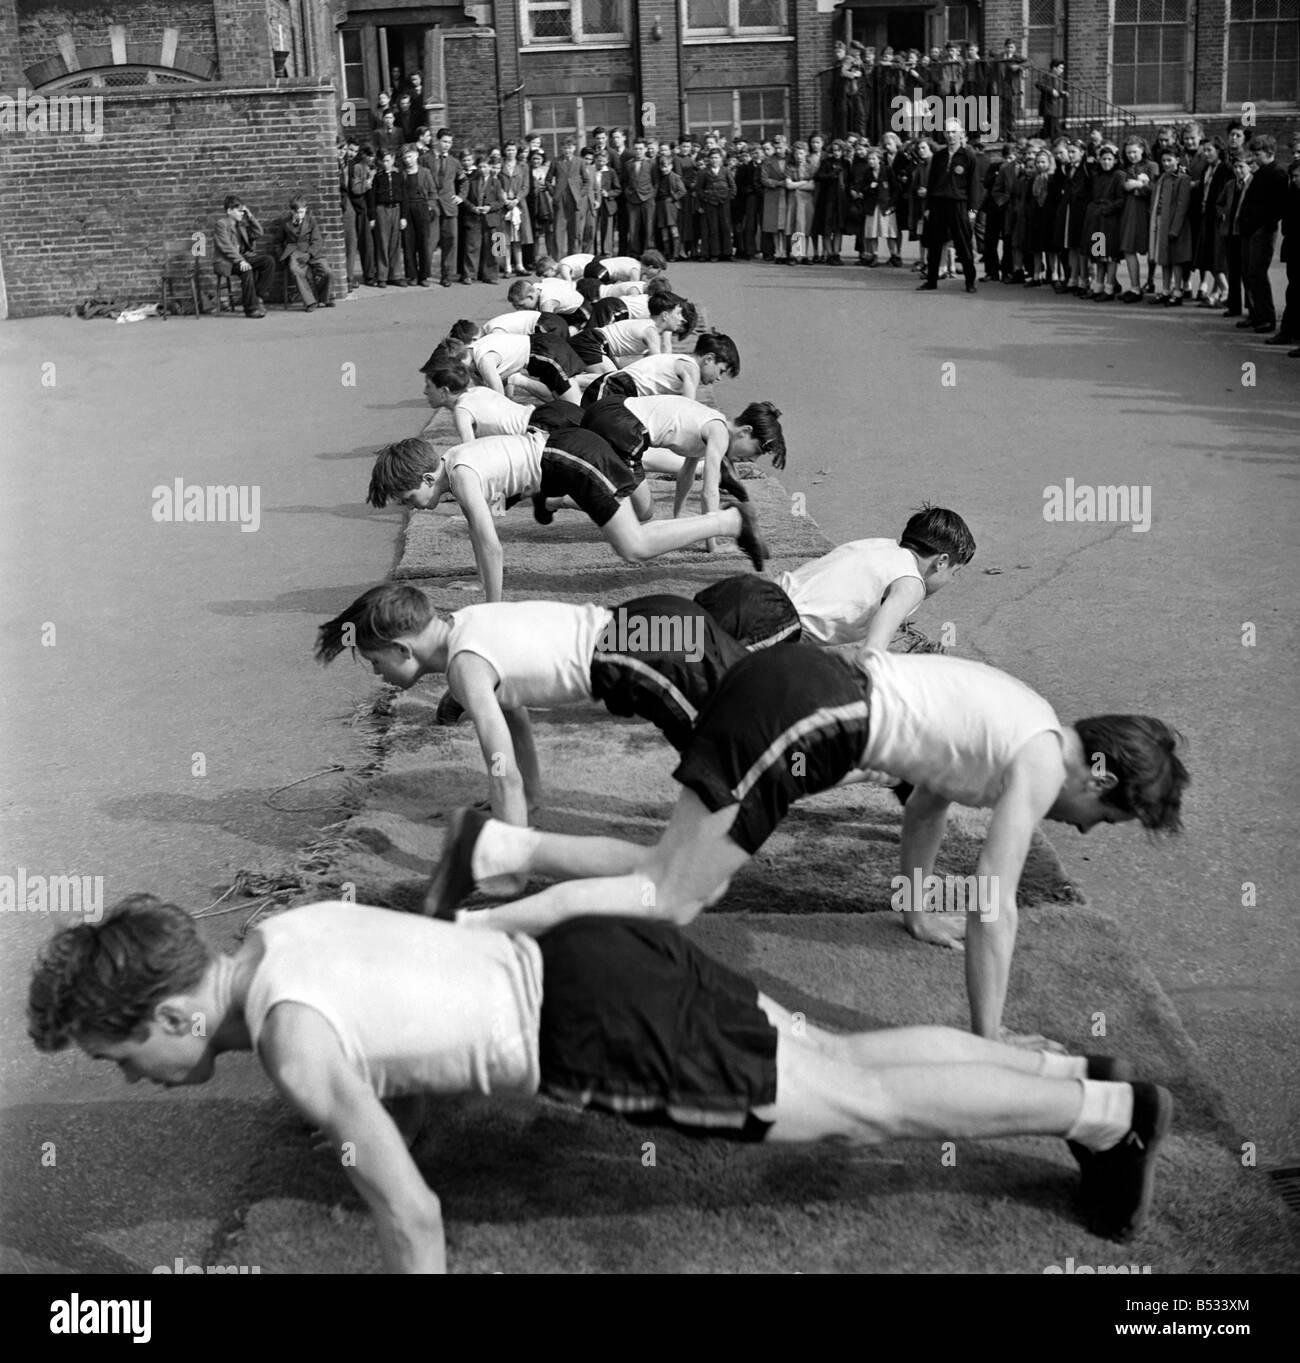 William Blake Secondary School, Battersea. Gymnastics. March 1952 C1257-001 - Stock Image